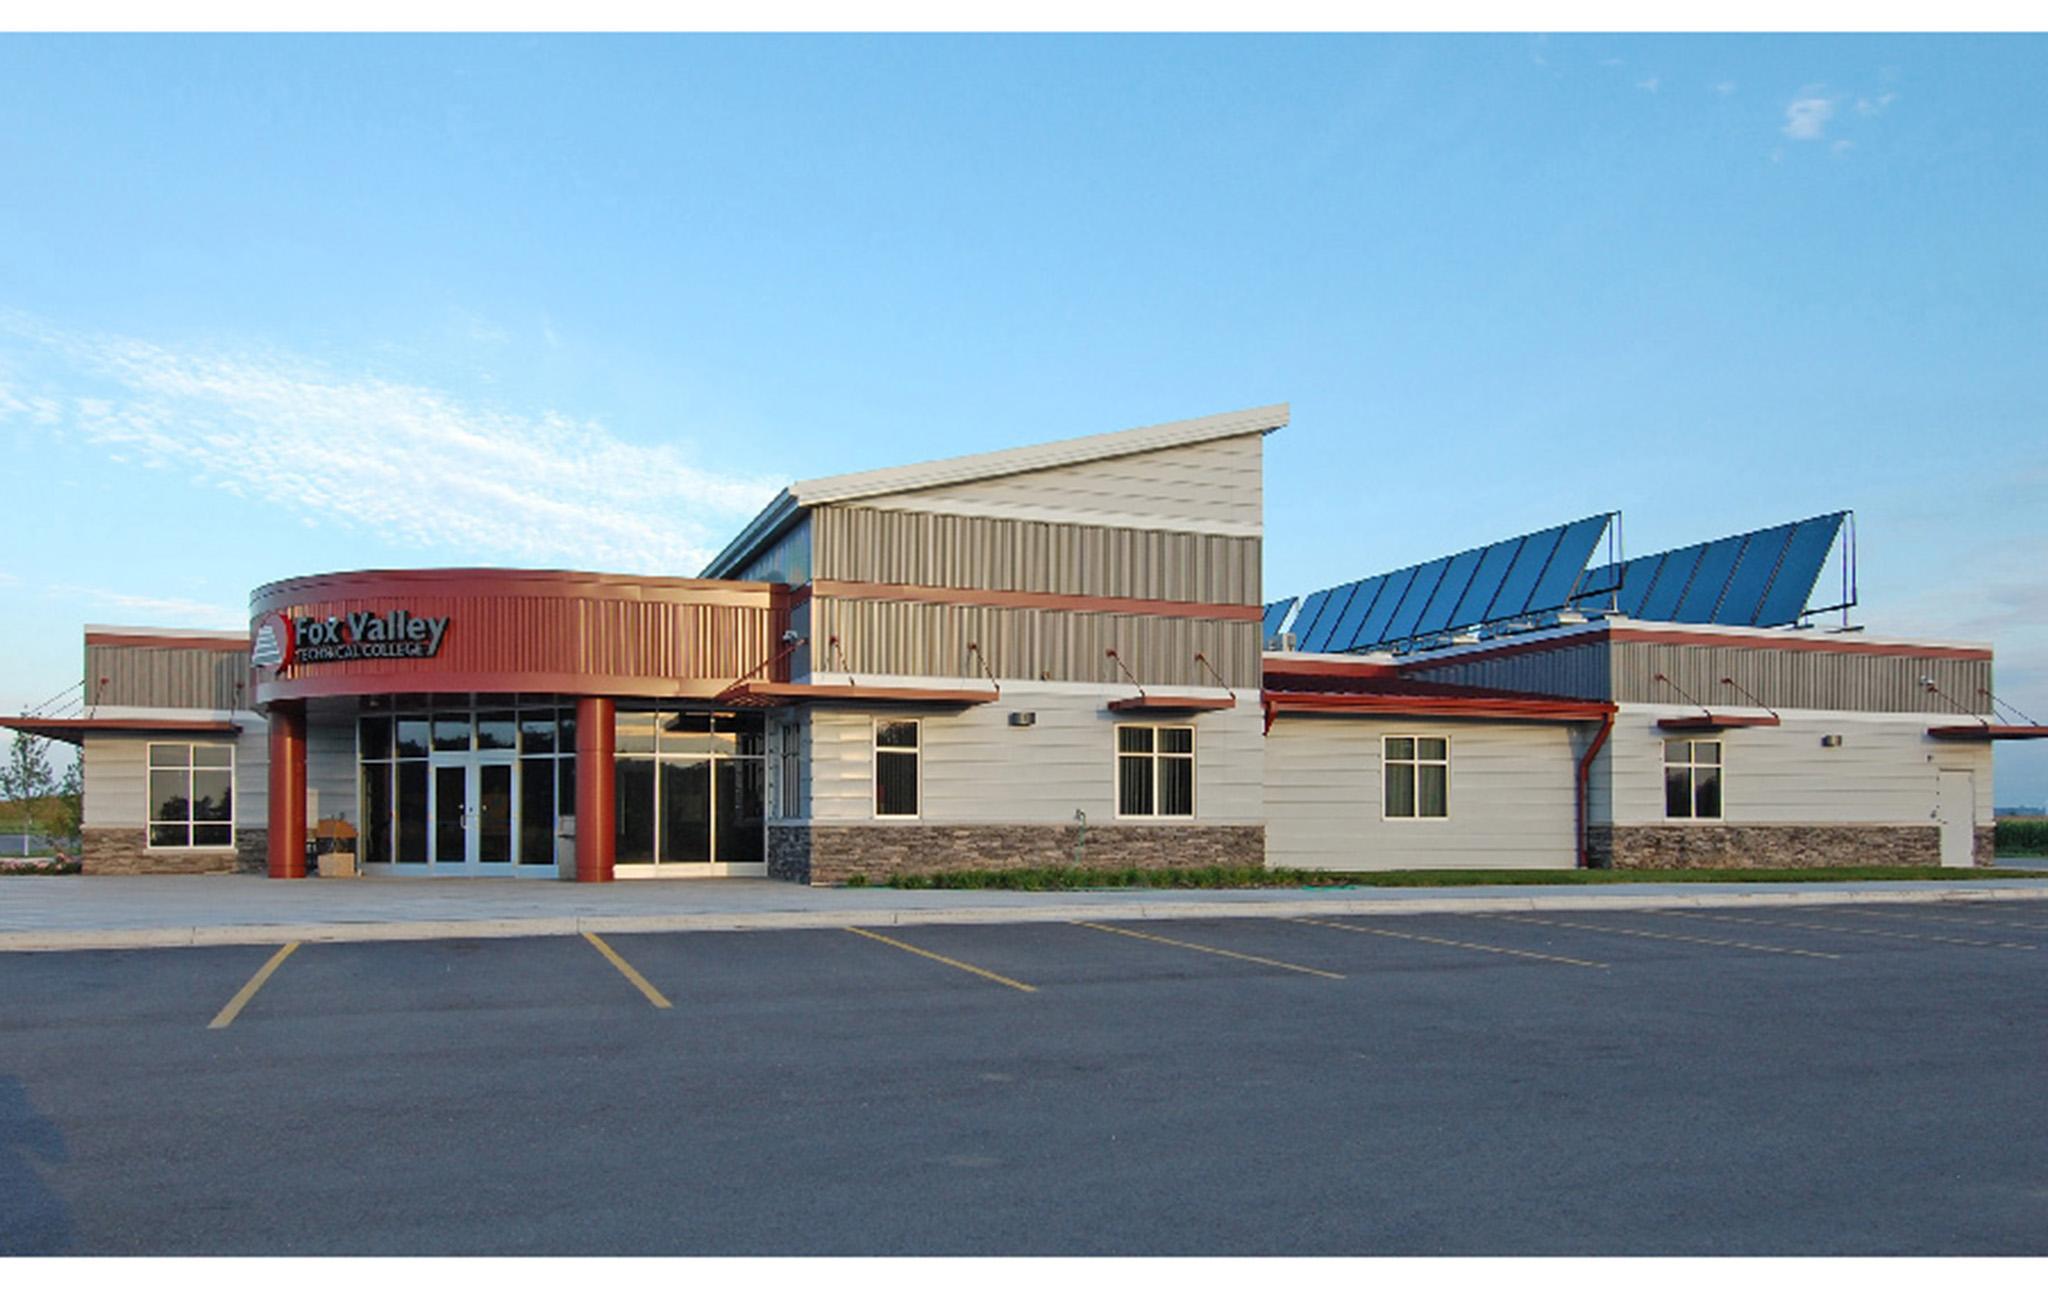 2_FVTC Regional Training Center